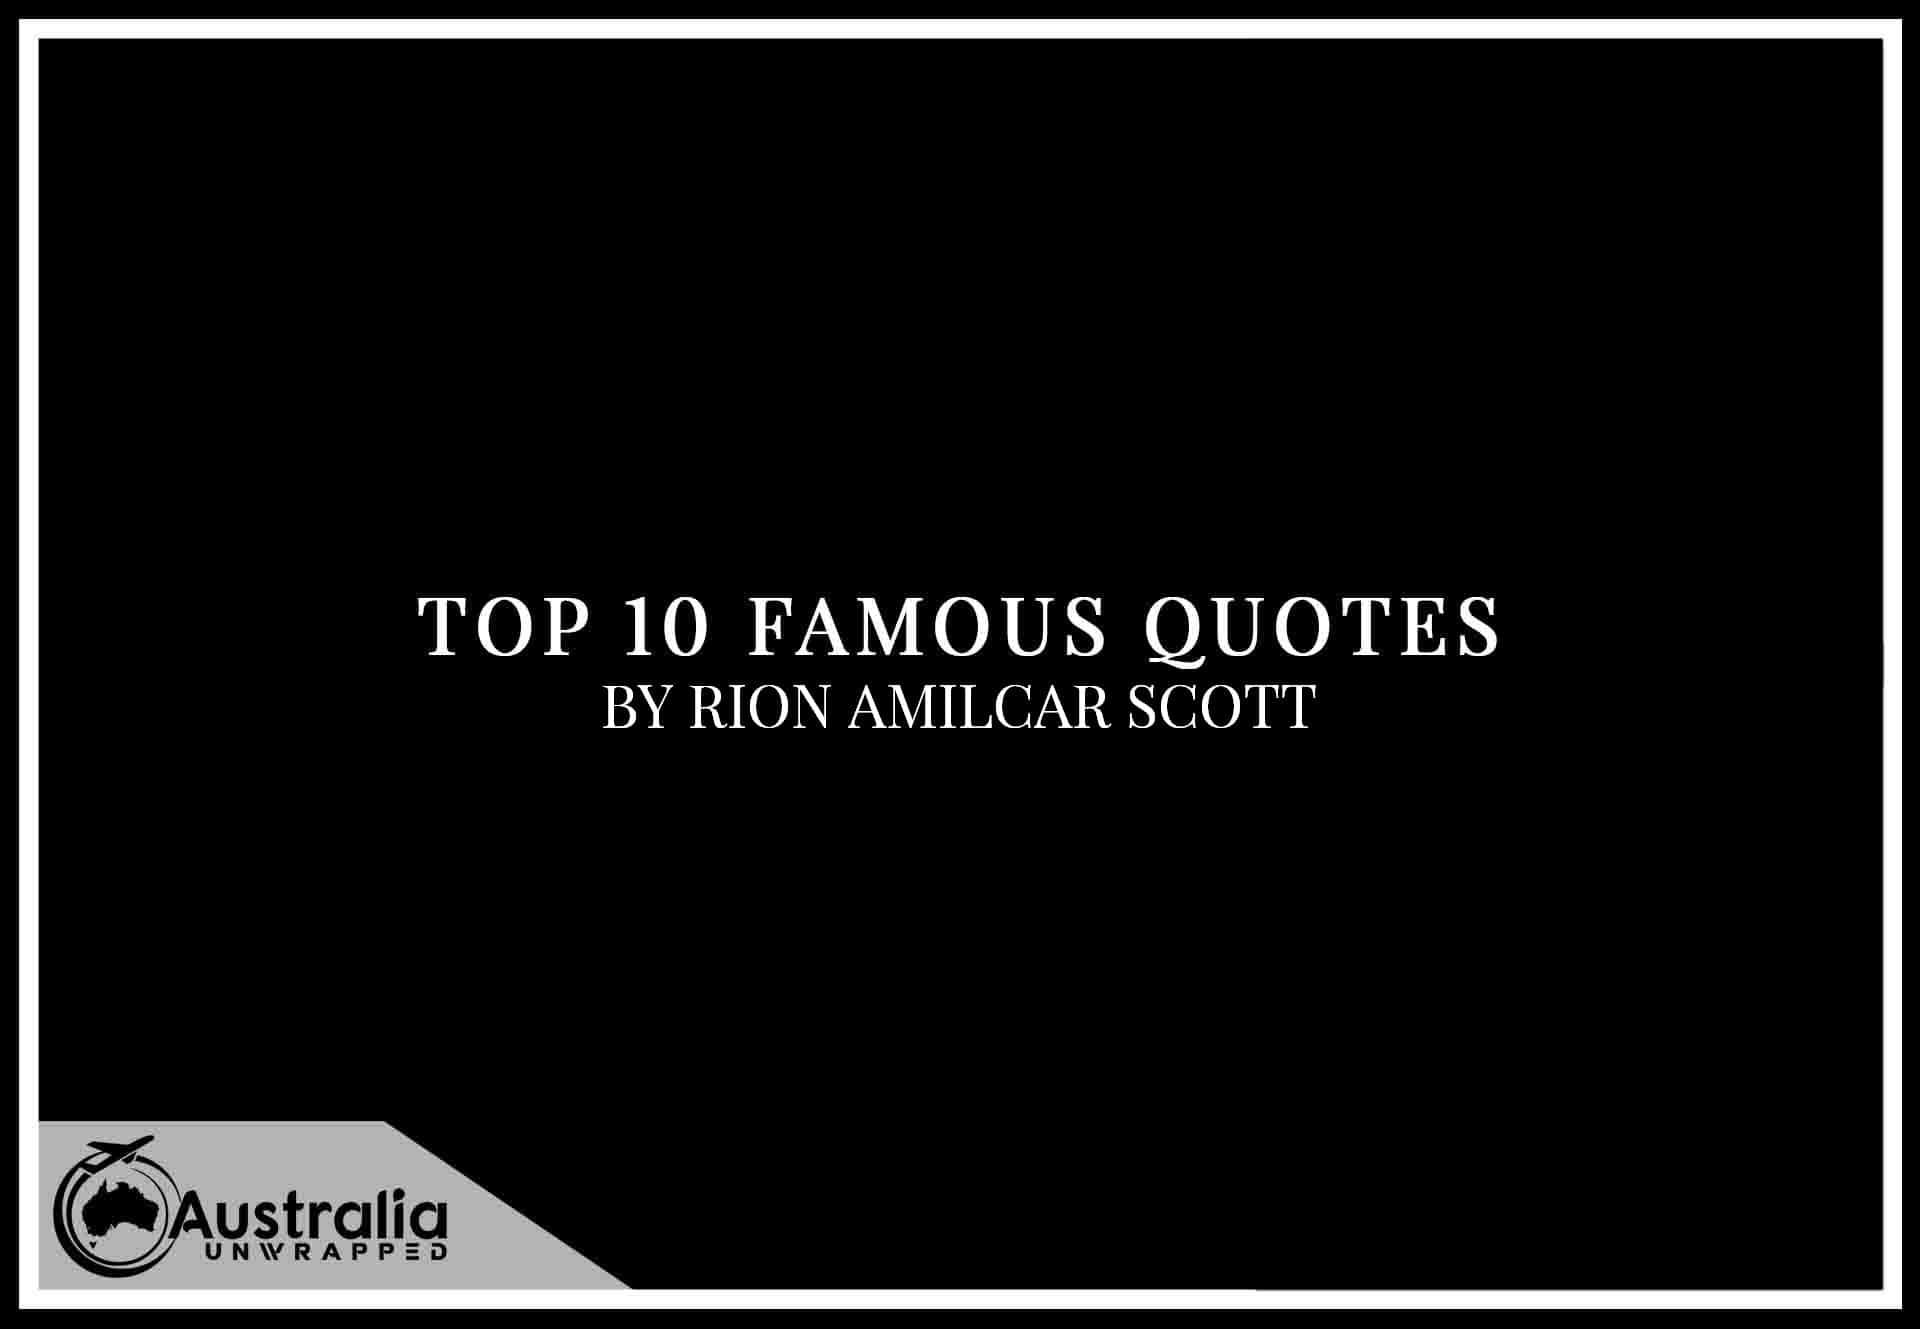 Top 10 Famous Quotes by Author Rion Amilcar Scott